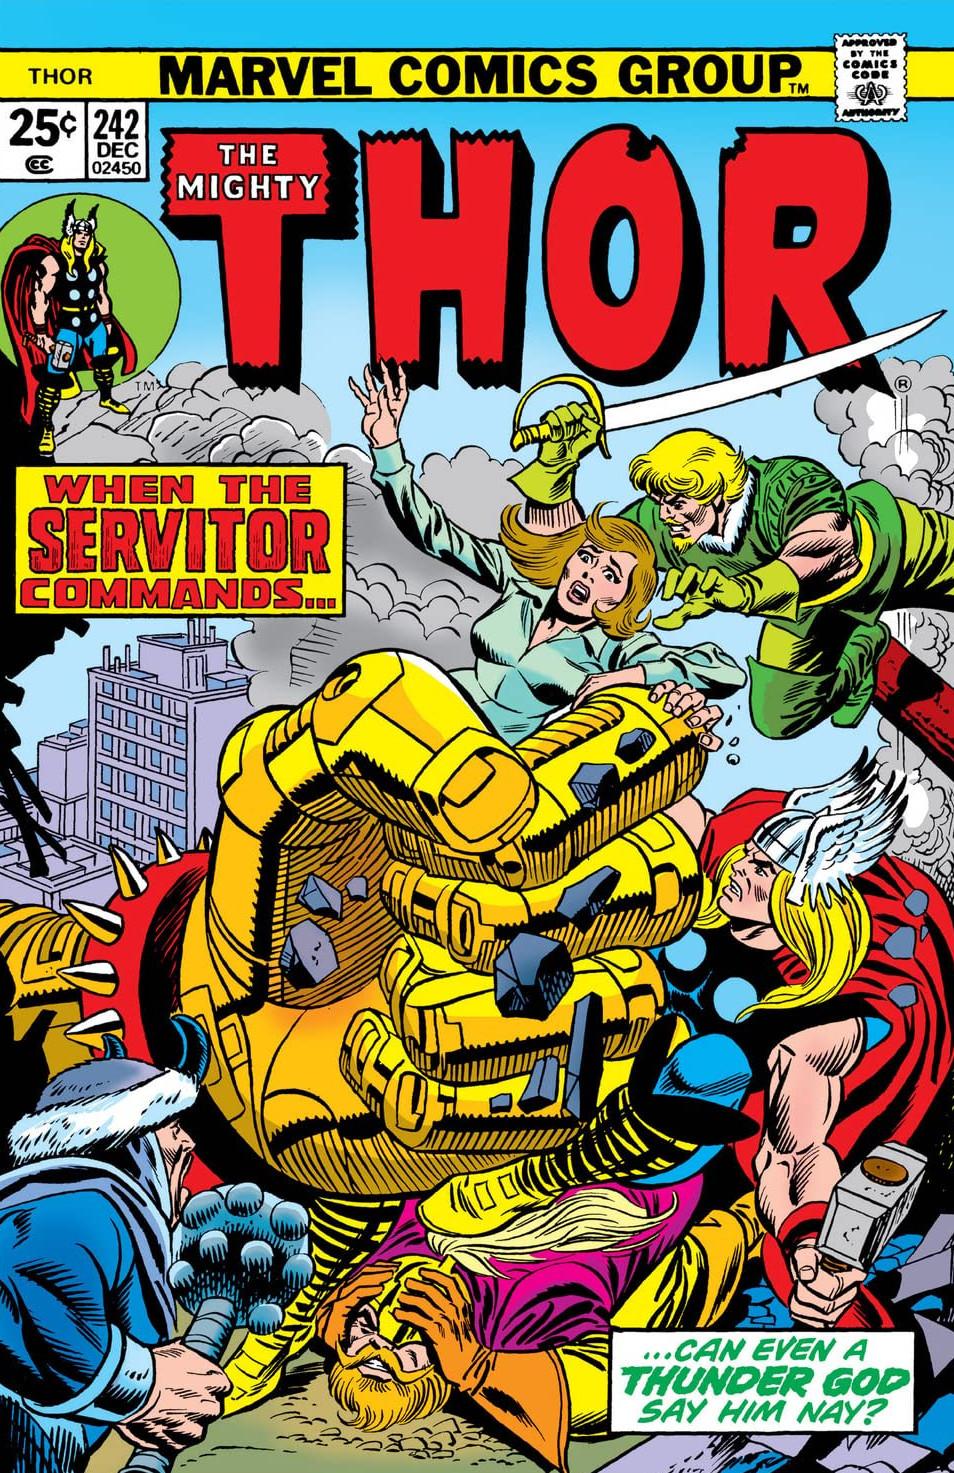 Thor Vol 1 242